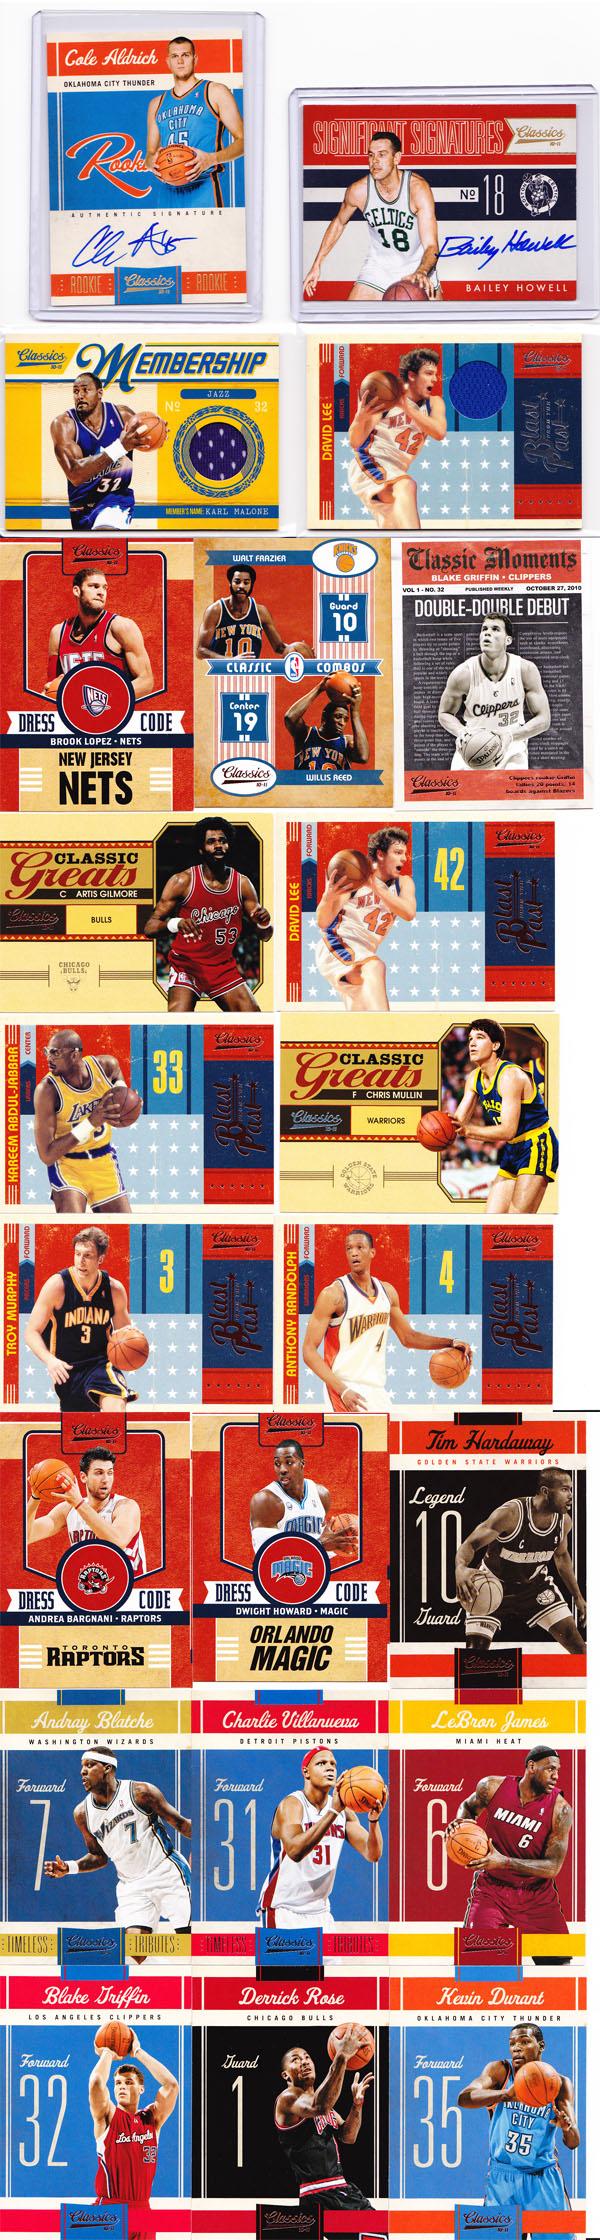 2010-11 Panini Classics Basketball Review 10